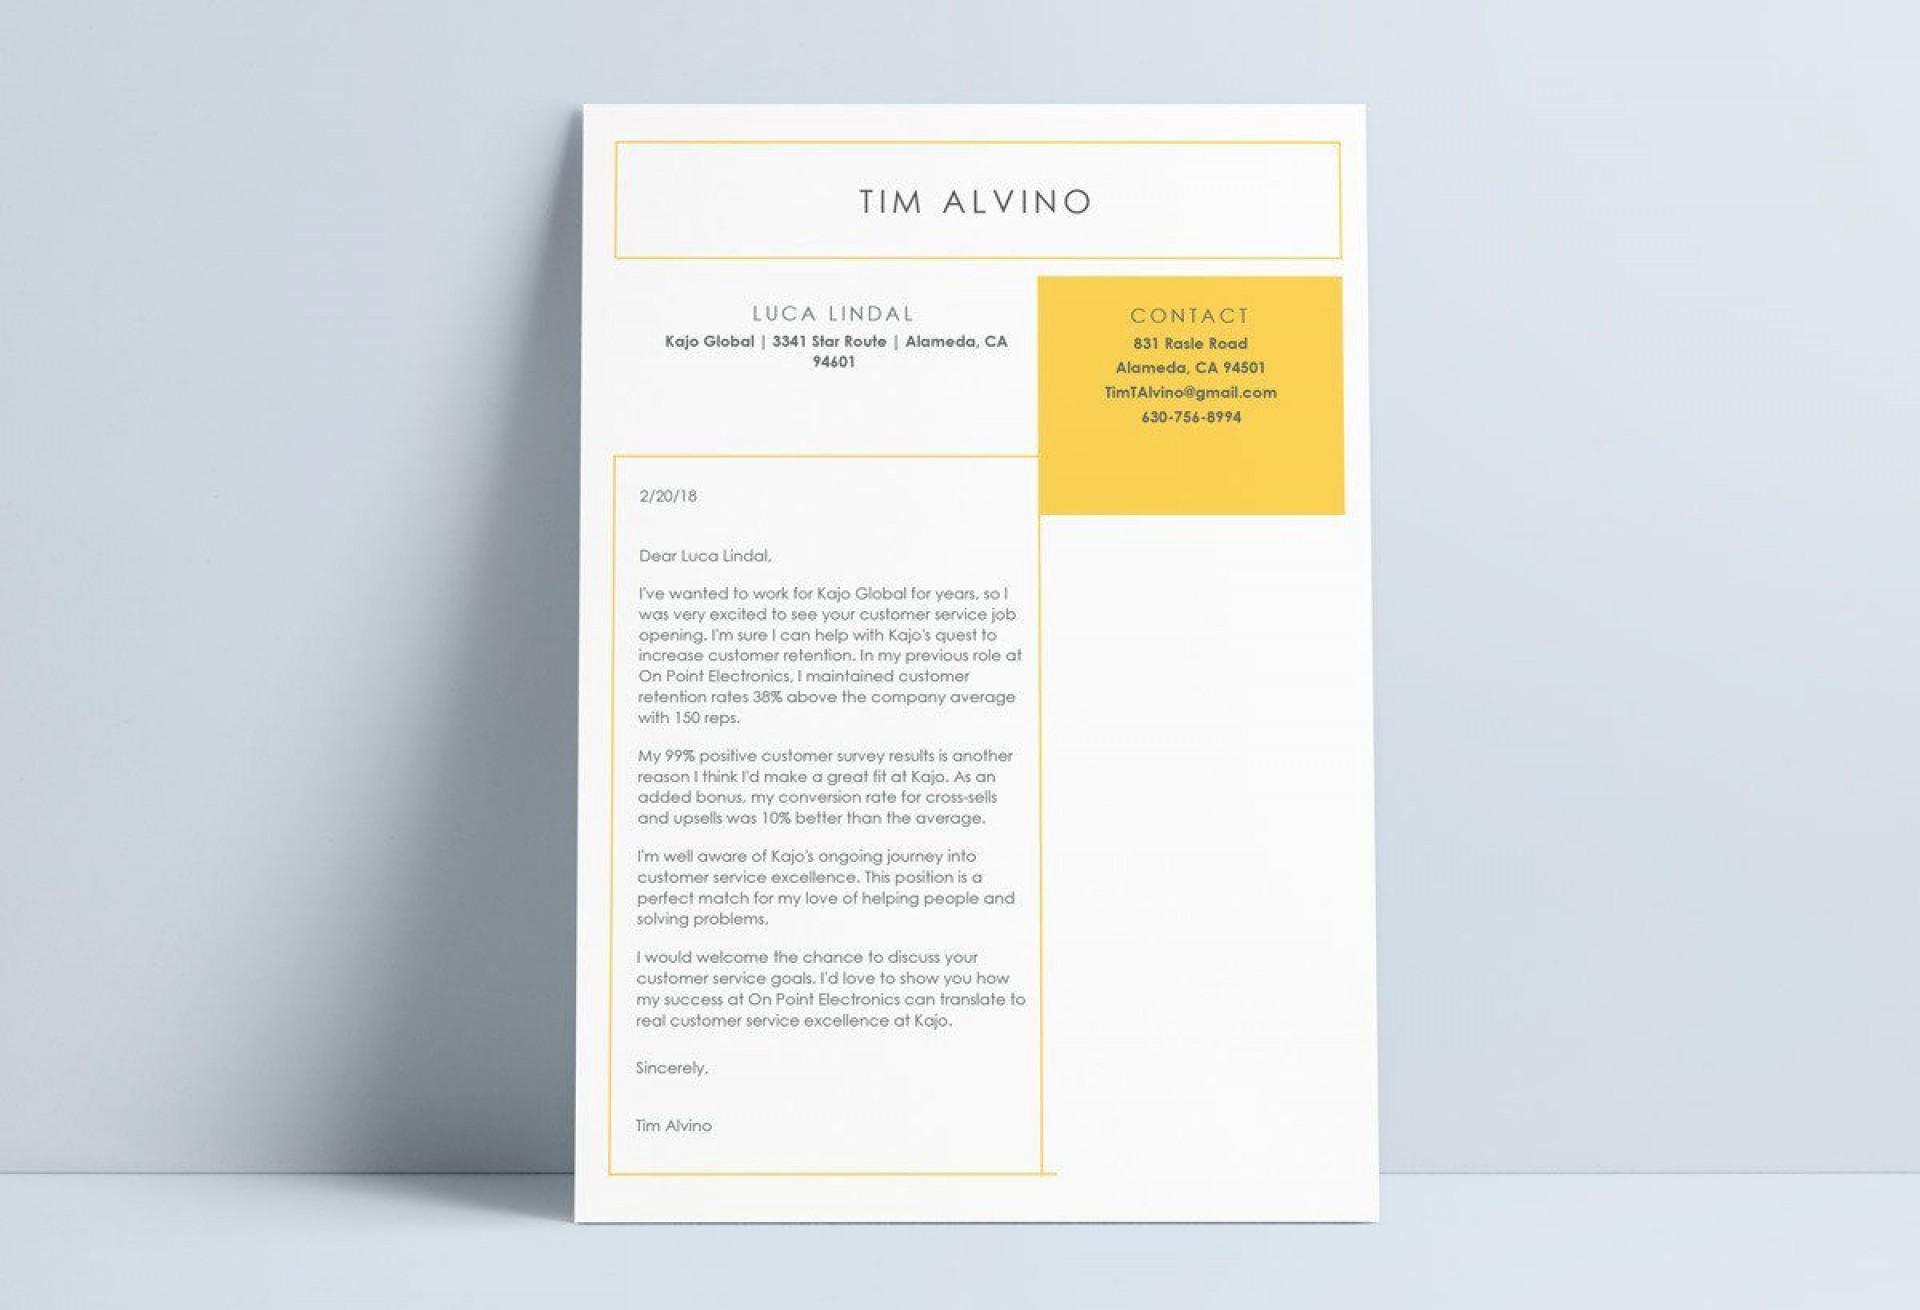 002 Impressive Cover Letter Template Download Pdf Image  Free1920